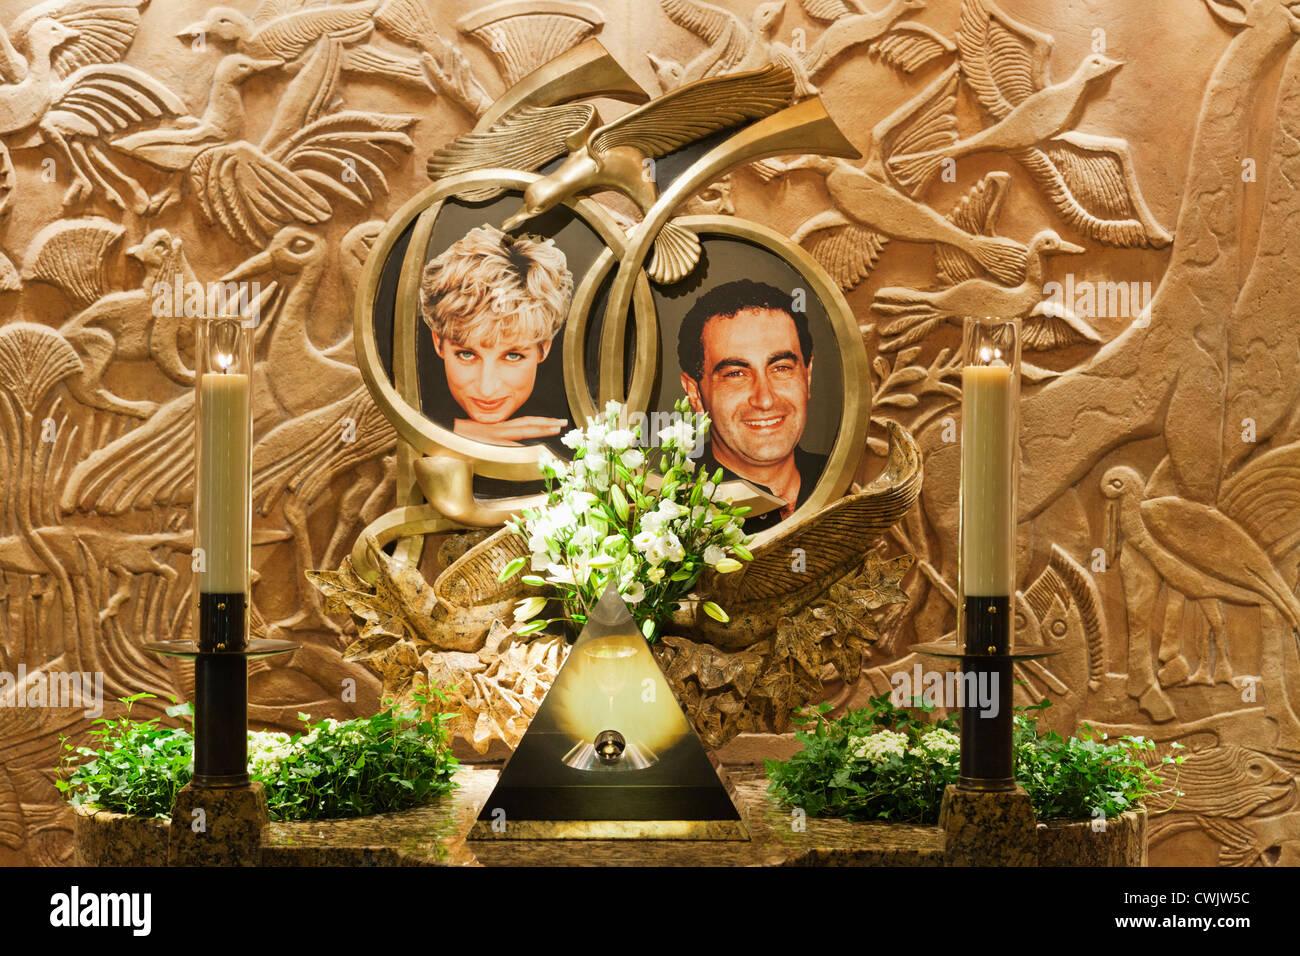 England, London, Knightsbridge, Harrods, Prinzessin Diana und Dodi Al Alara Memorial Fountain Stockbild